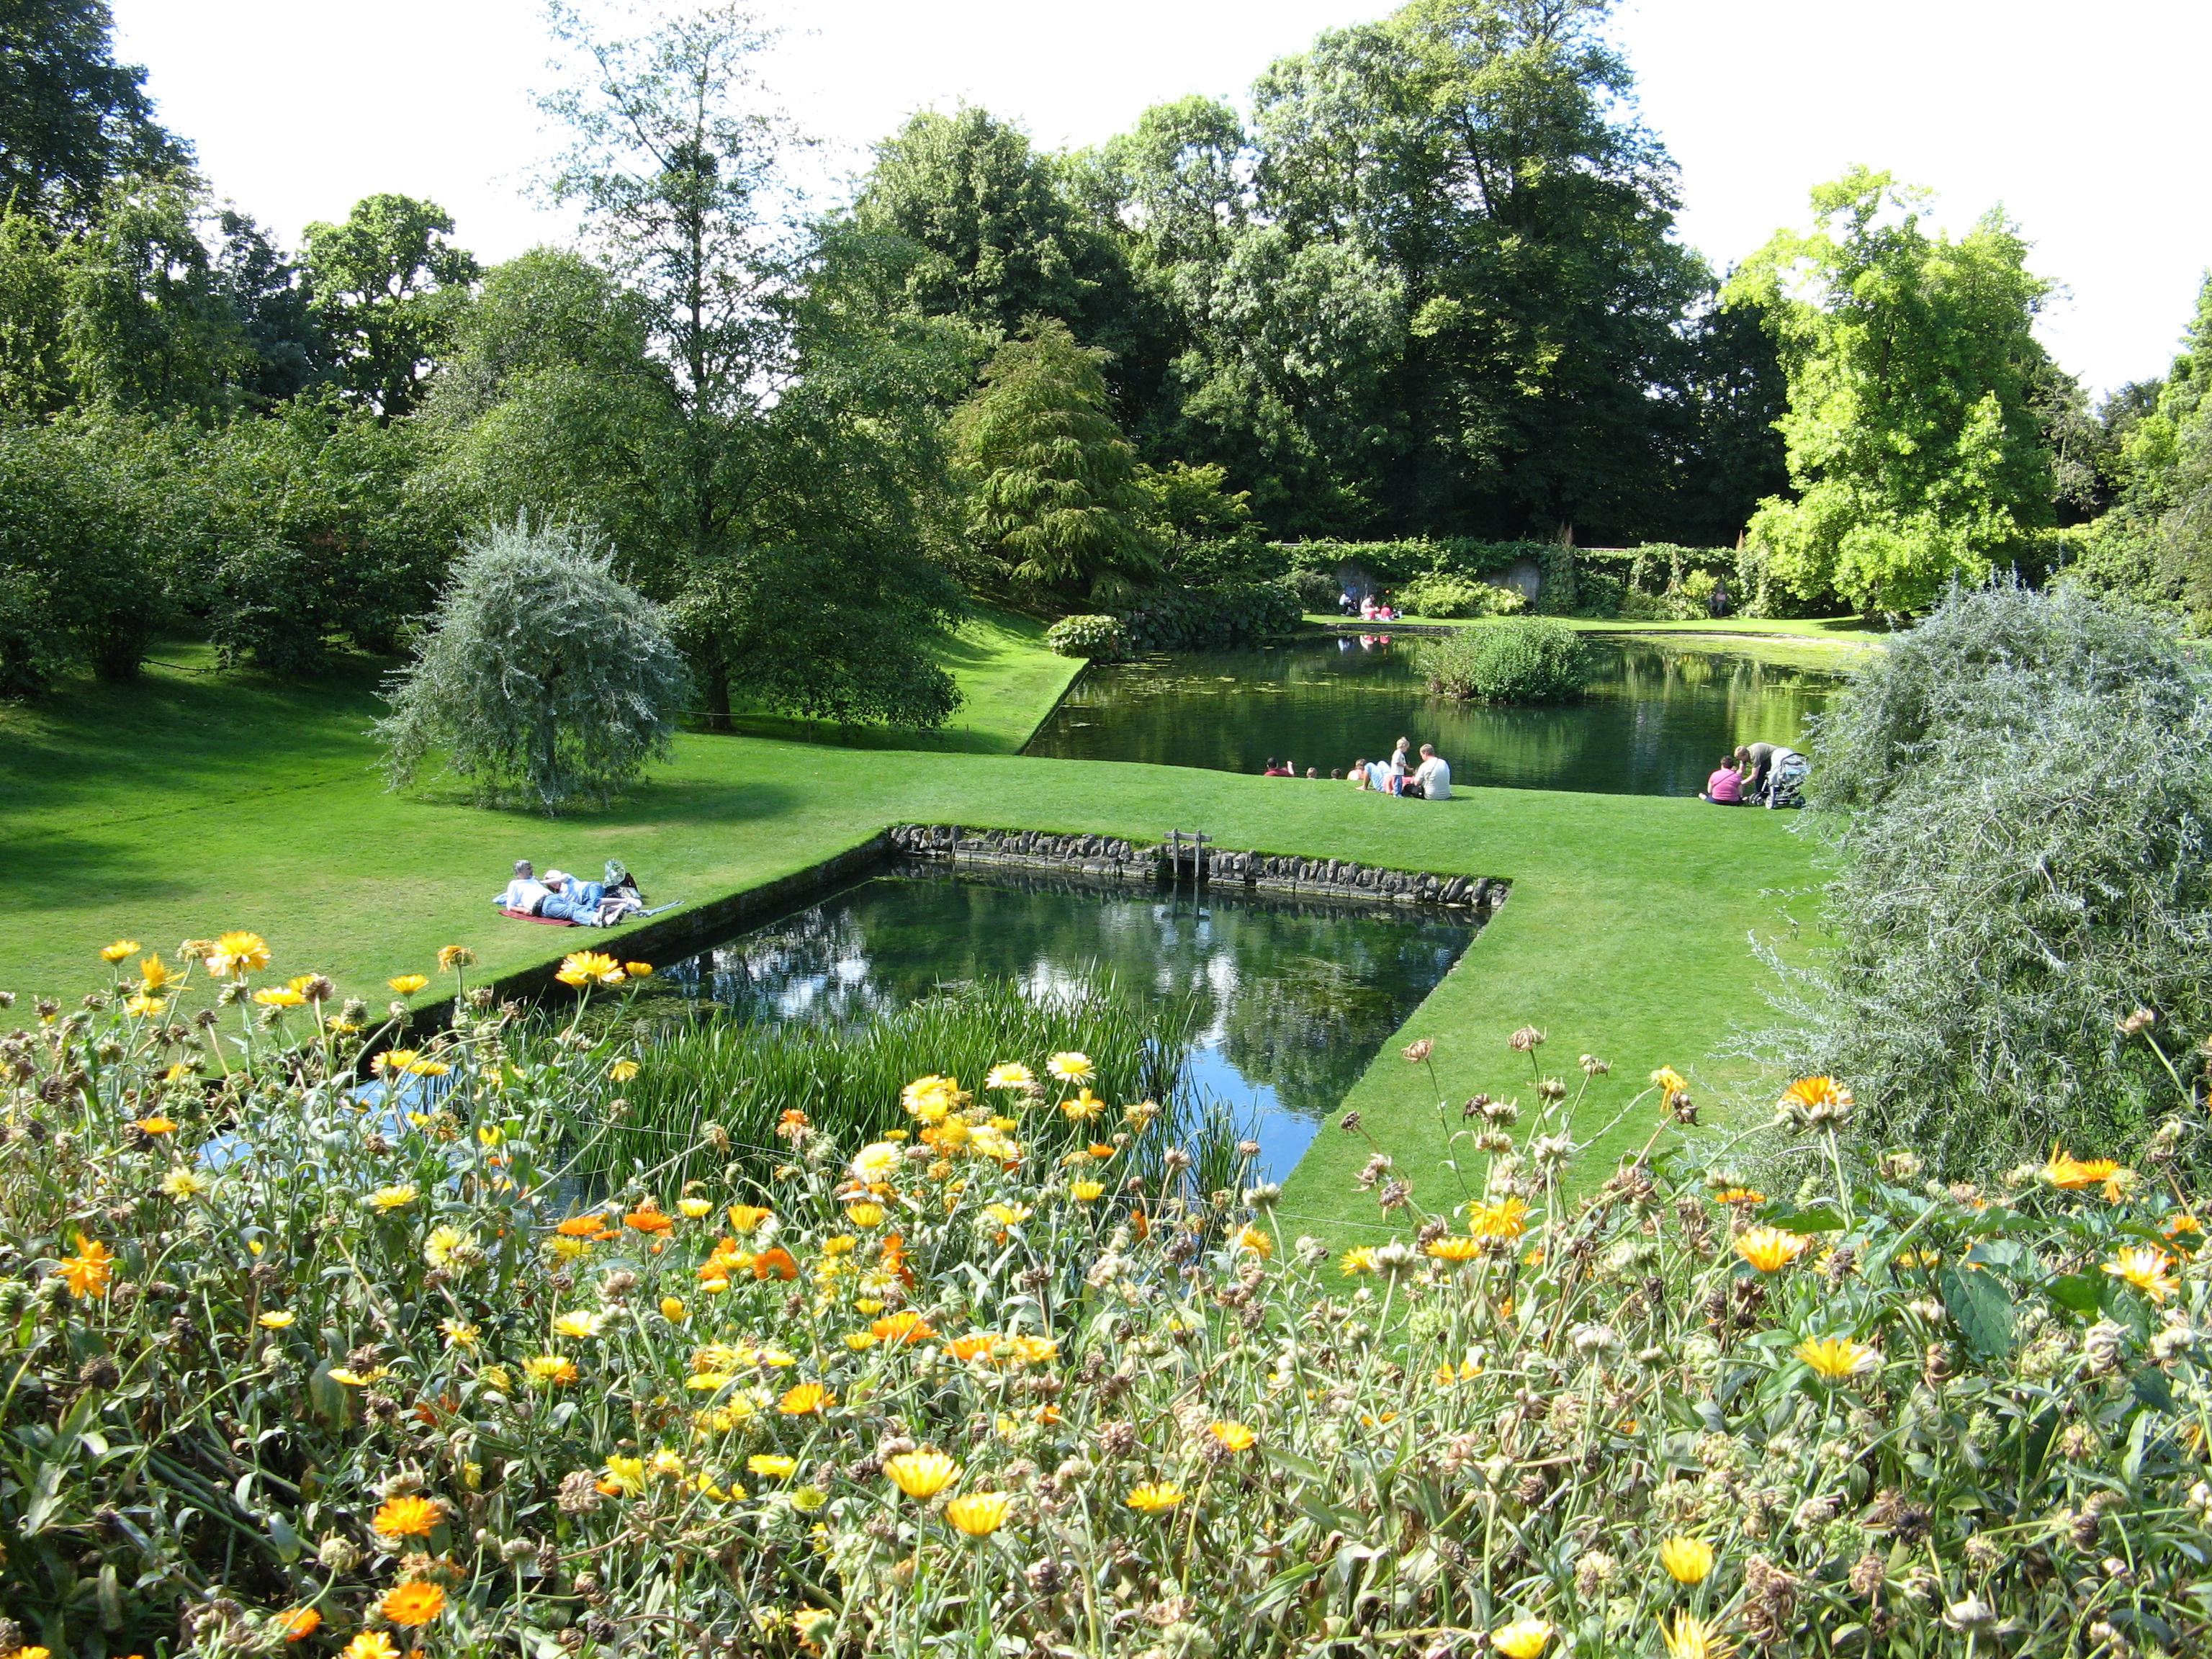 Description dyrham park garden ponds from east